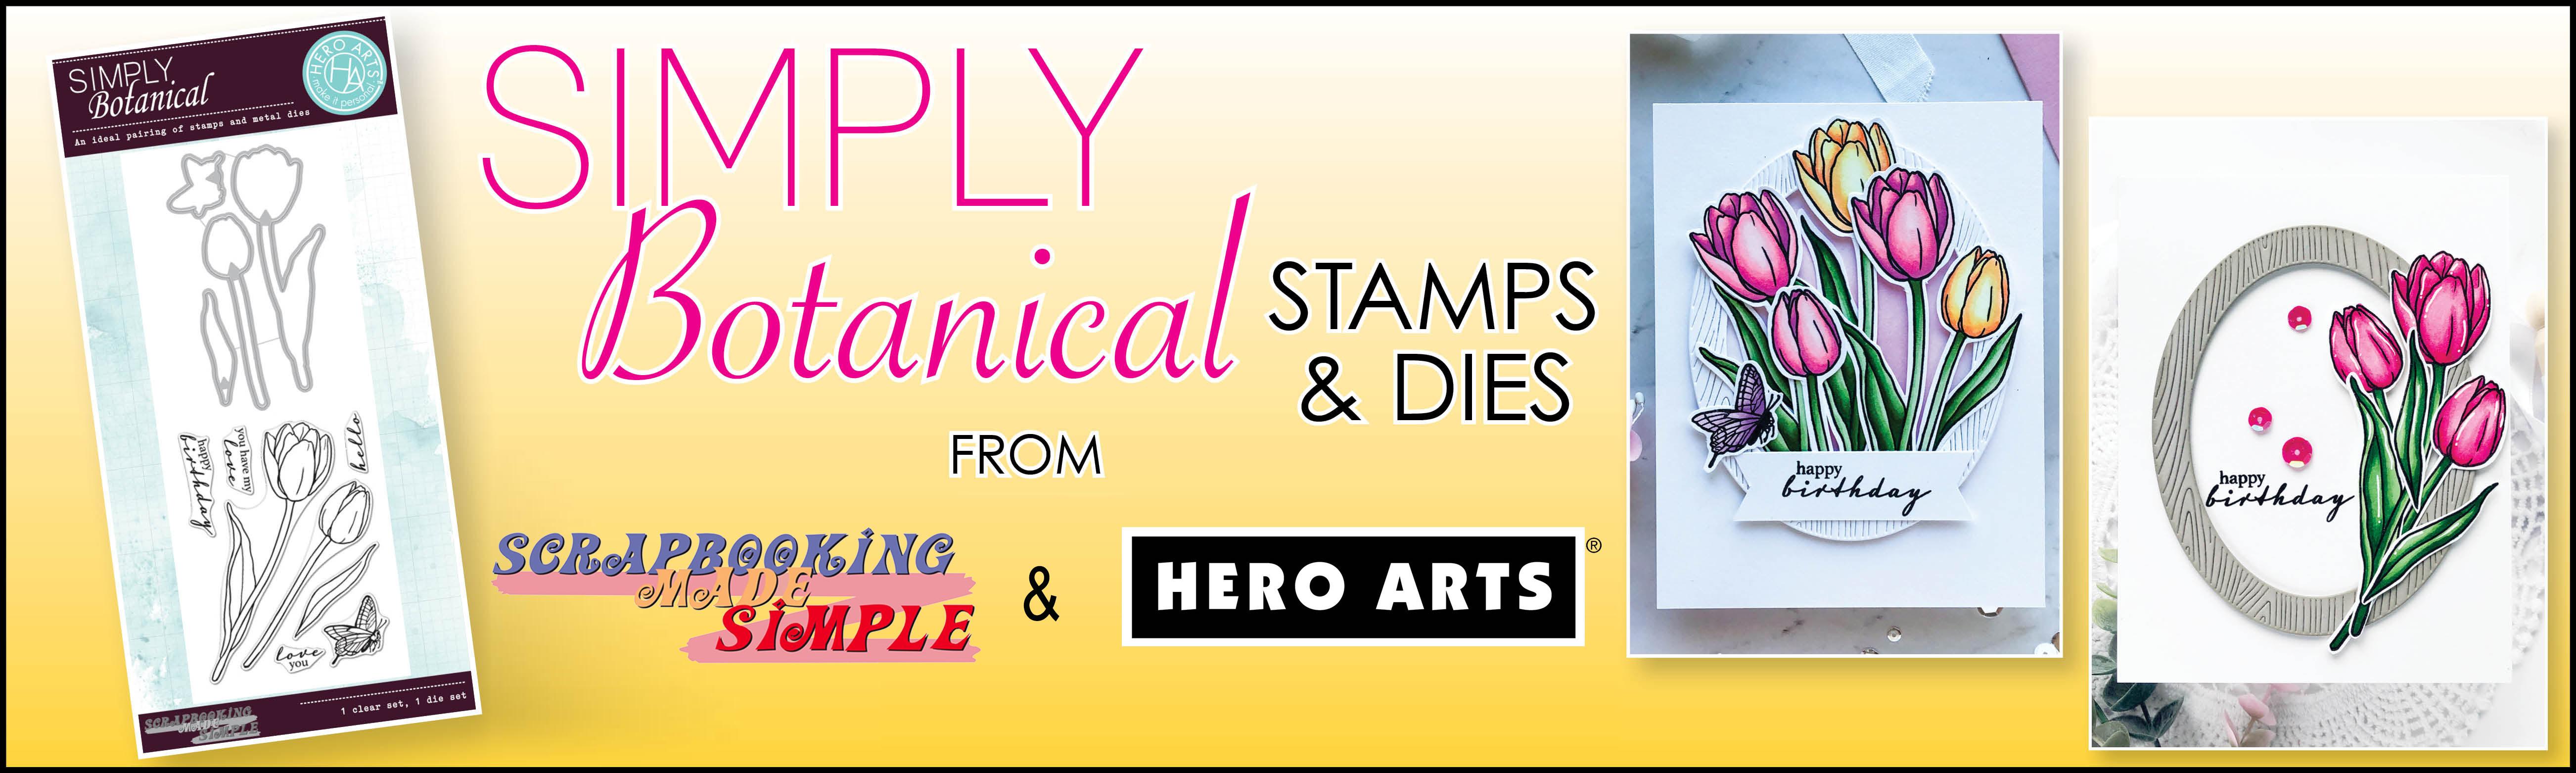 hero-arts-simply-botanicals-sms-banner.jpg